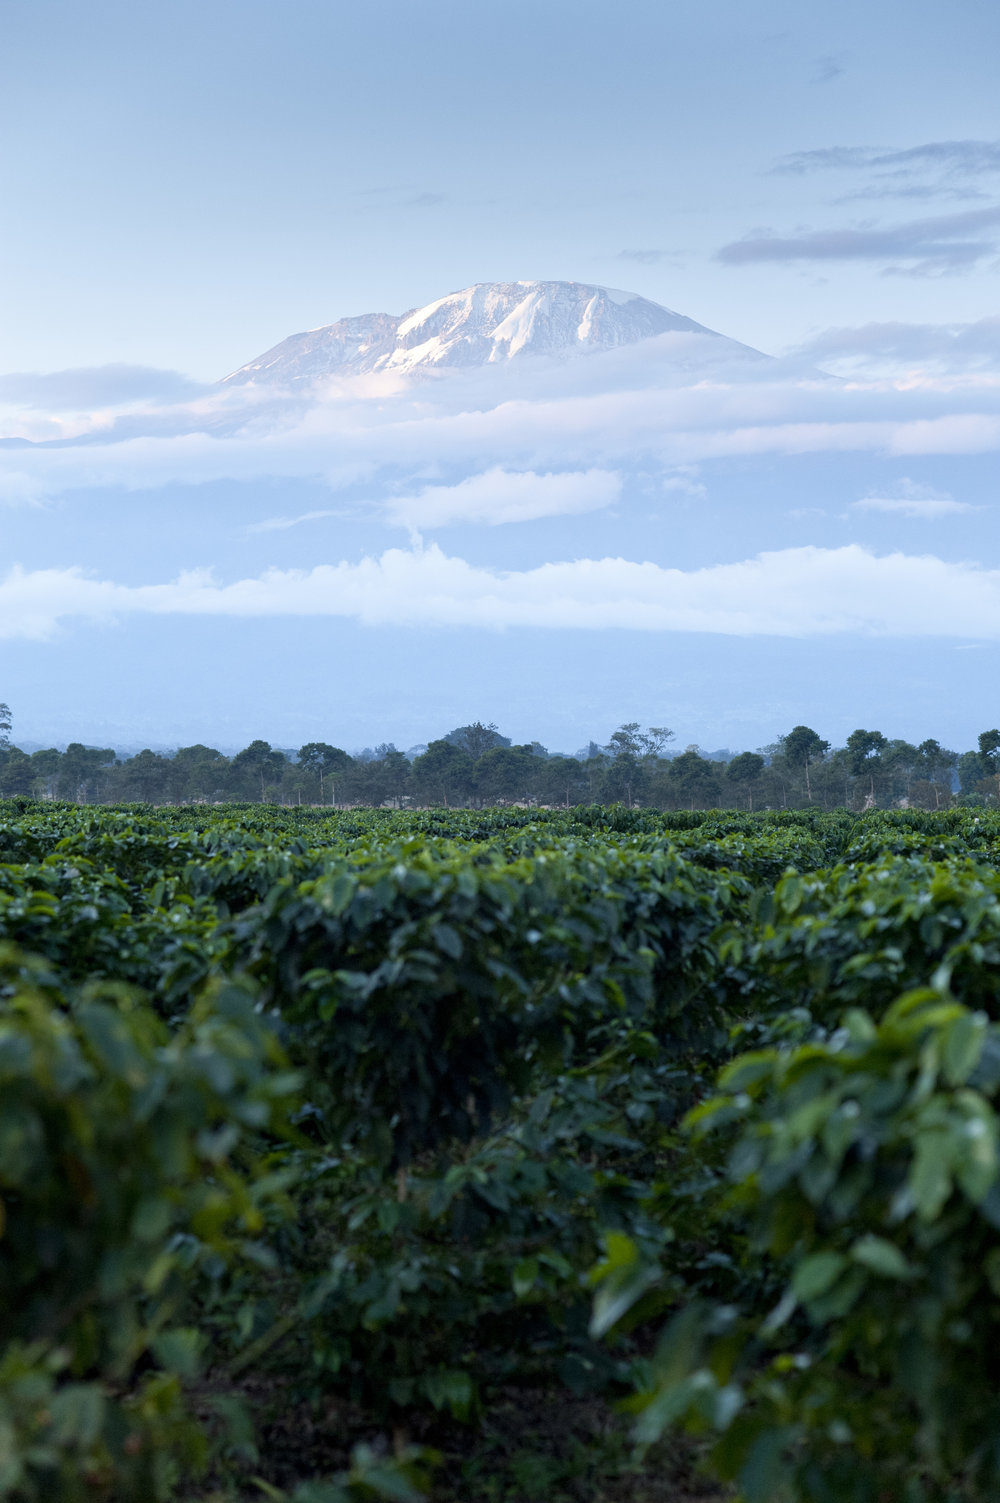 GDF Fundraiserclimb - Mt. kilimanjaro - moshi, kilimanjarodates tbc